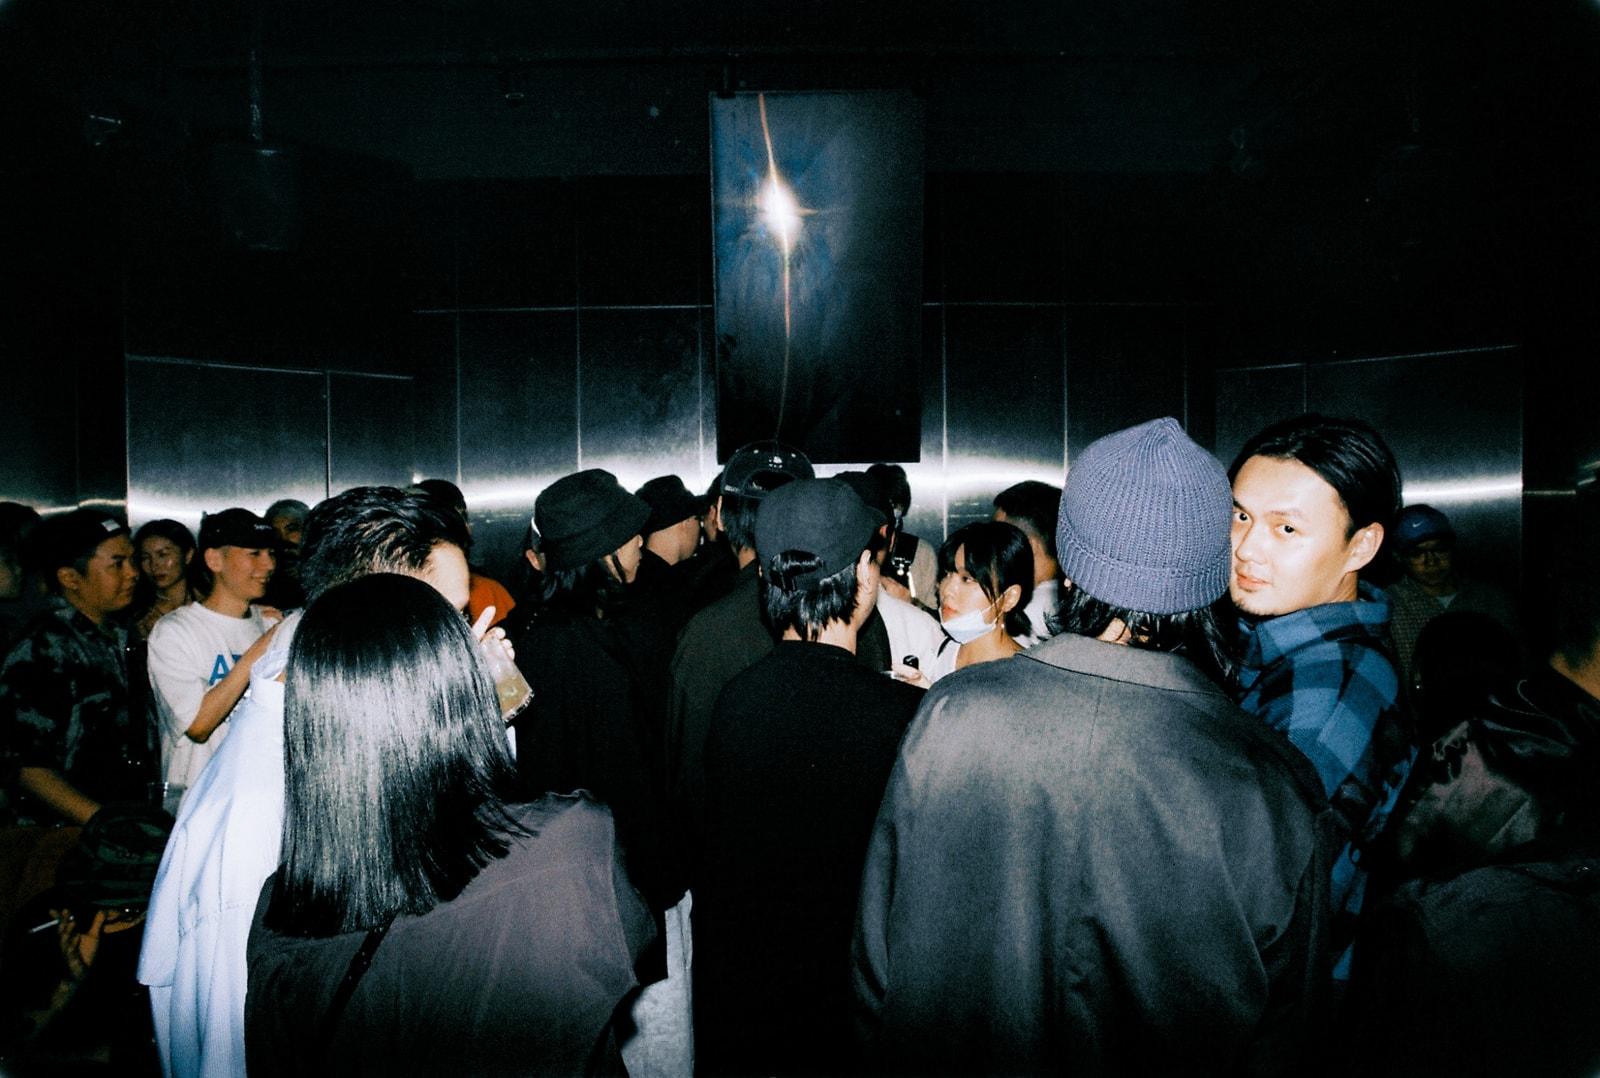 HYPEBEAST 現場直擊 PLATEAU STUDIO「線下聊天室」派對活動